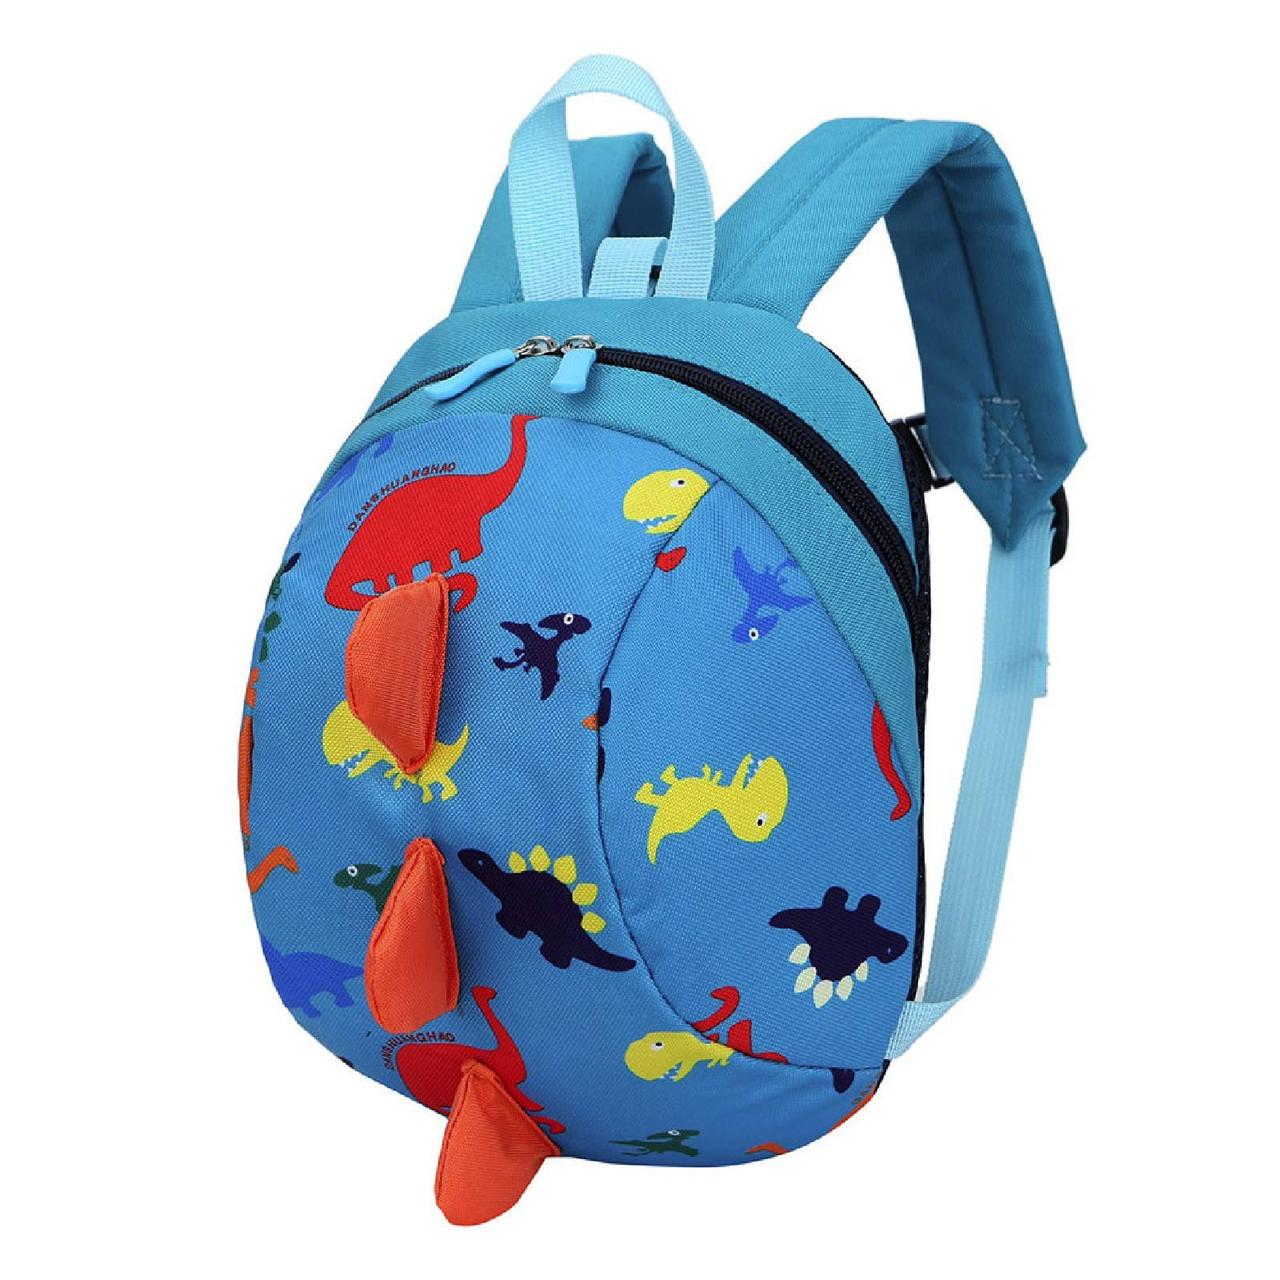 Дитячий рюкзак, блакитний. Динозавр